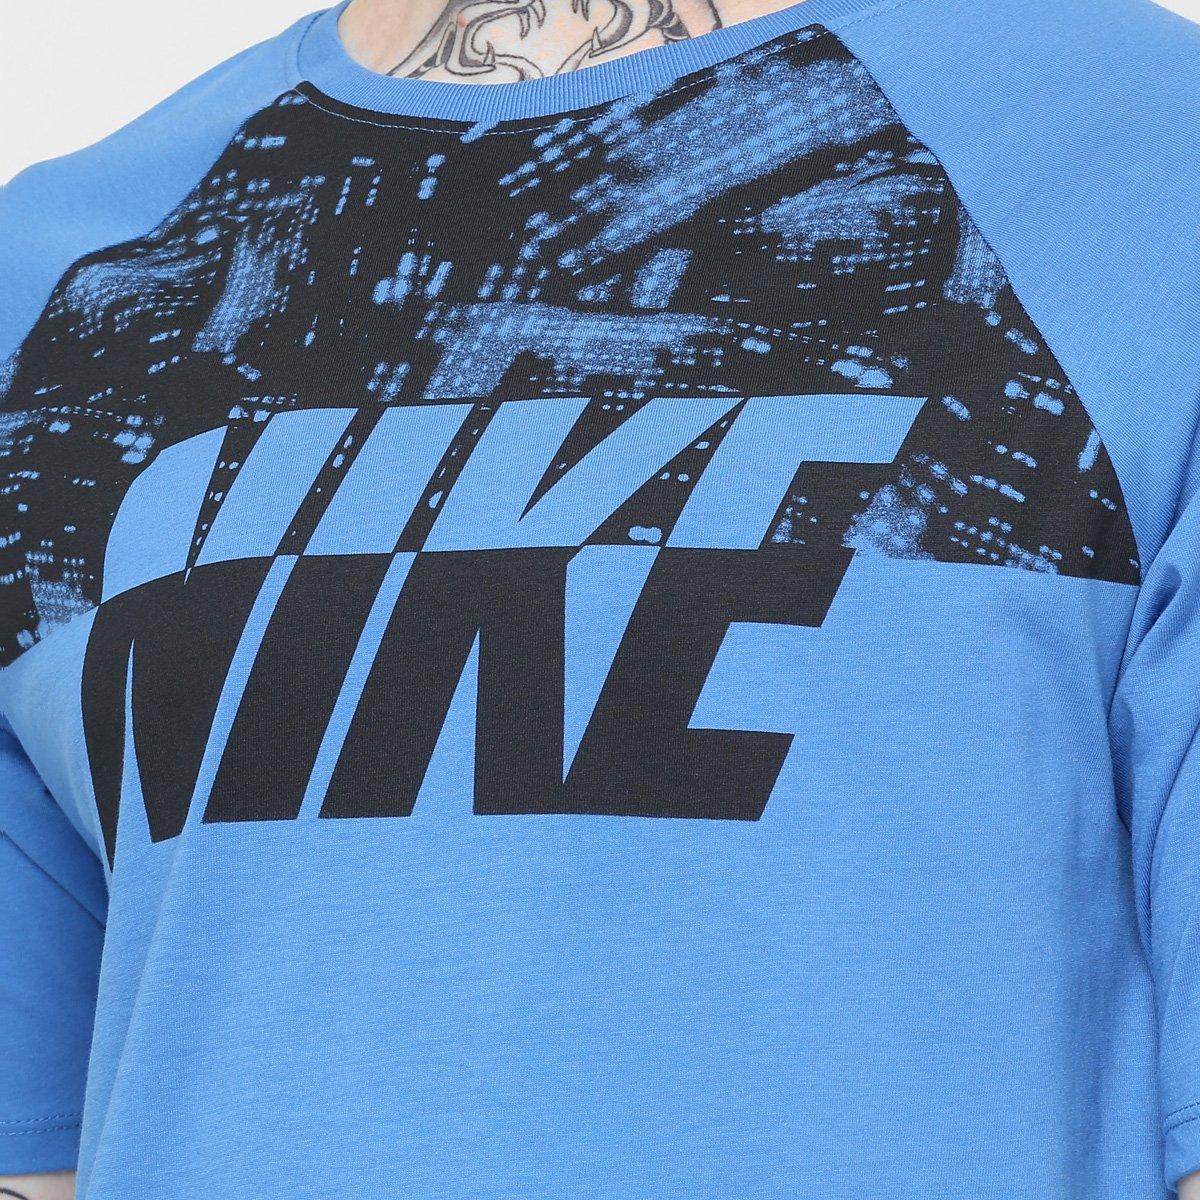 7847a0fccb Camiseta Nike Tee-City Lights Ss Raglan - Compre Agora